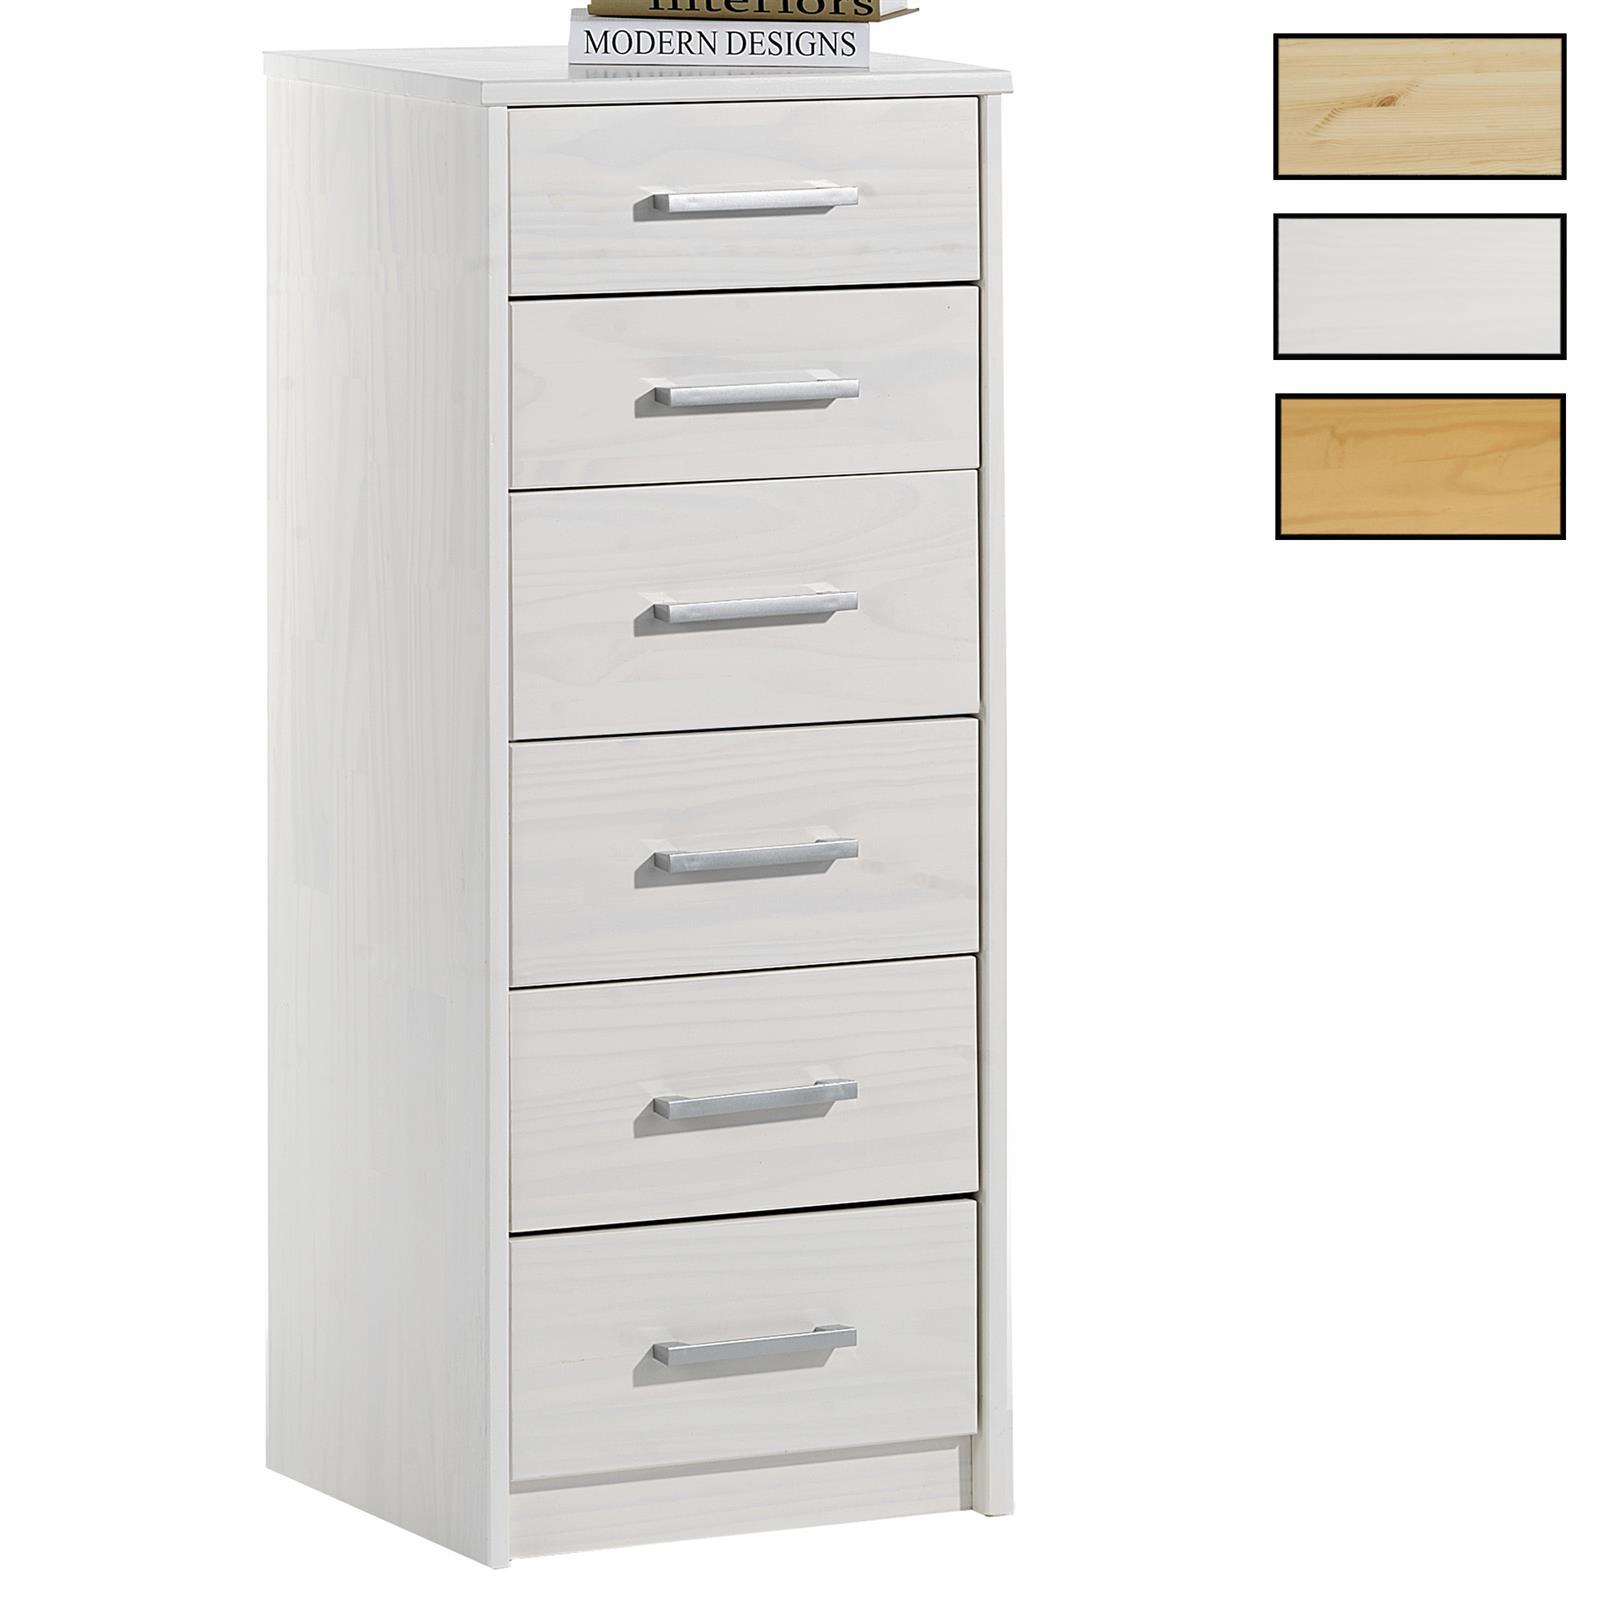 chiffonnier en pin tessa 2 4 tiroirs 3 coloris. Black Bedroom Furniture Sets. Home Design Ideas